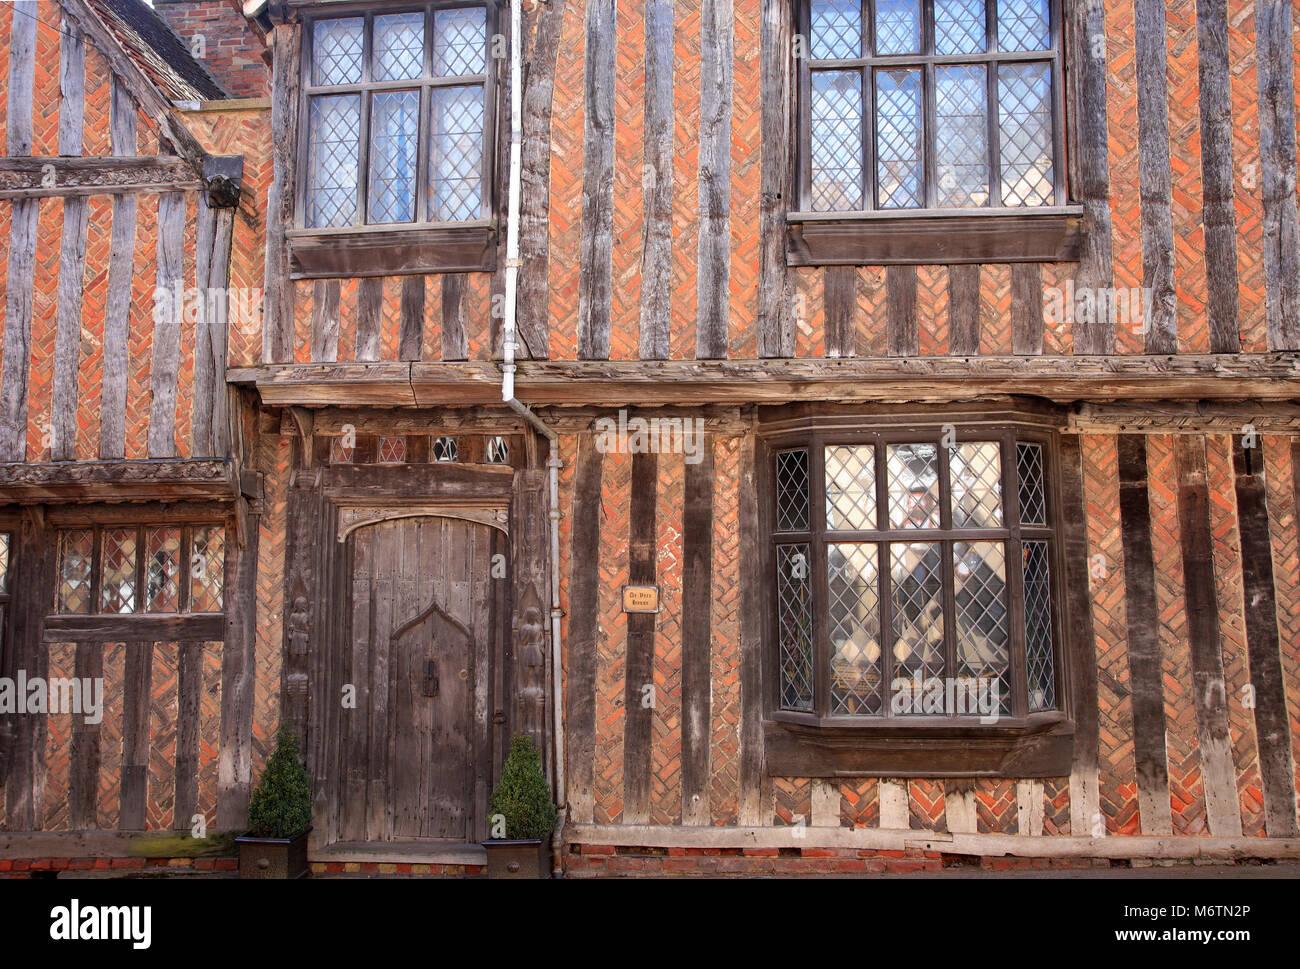 The De Vere House, Lavenham village, Suffolk County, England, UK - Stock Image